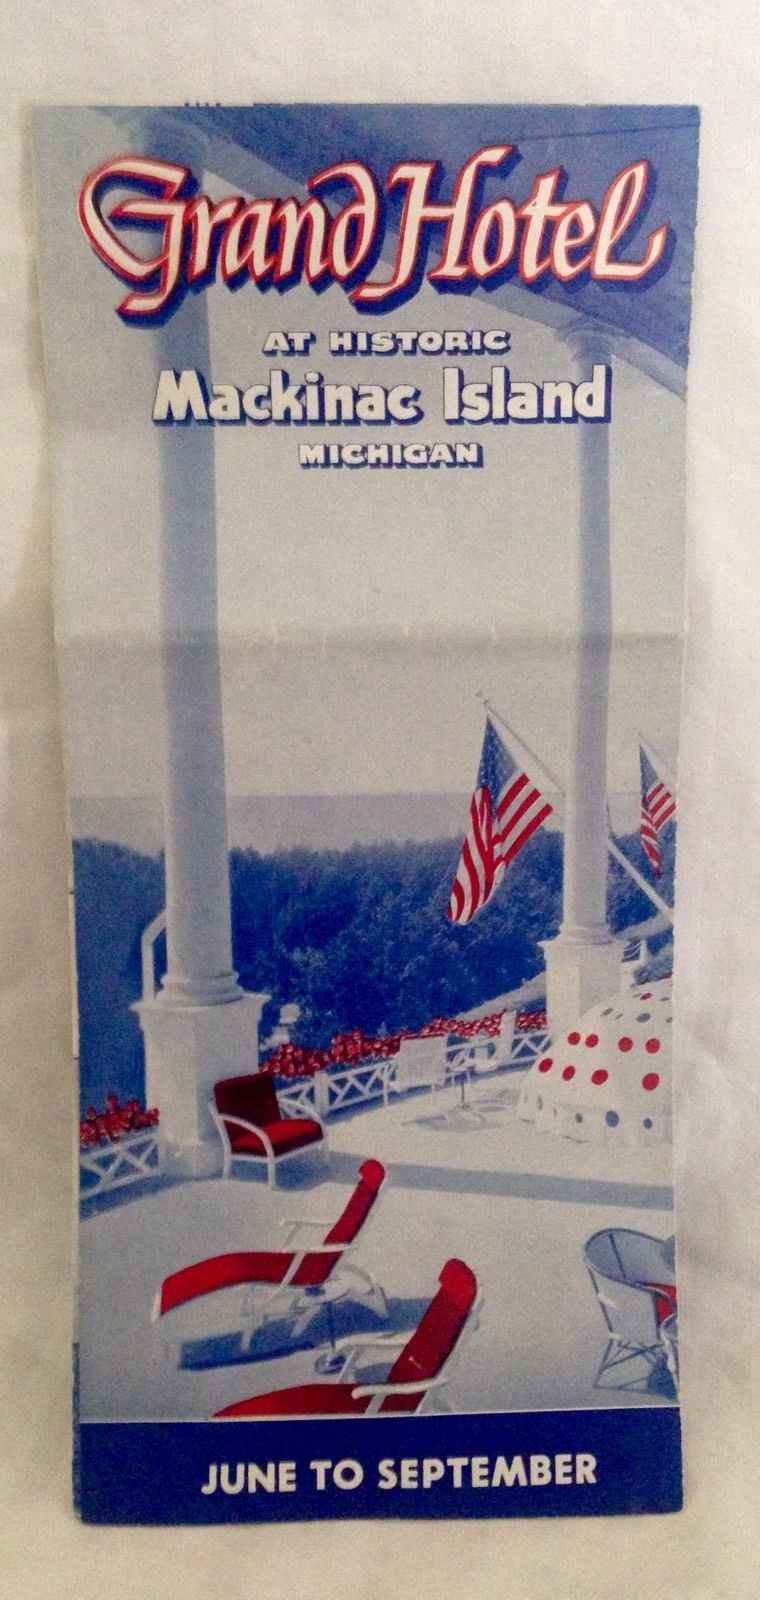 Vintage Michigan Travel Brochure -- Grand Hotel Mackinac